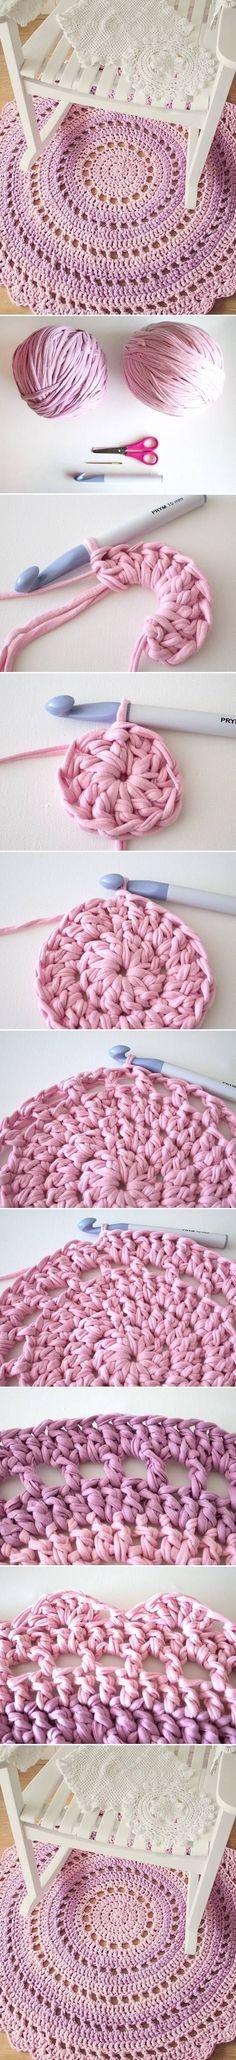 Crochet Mandala Rug Tutorial! by Macarena Kreps